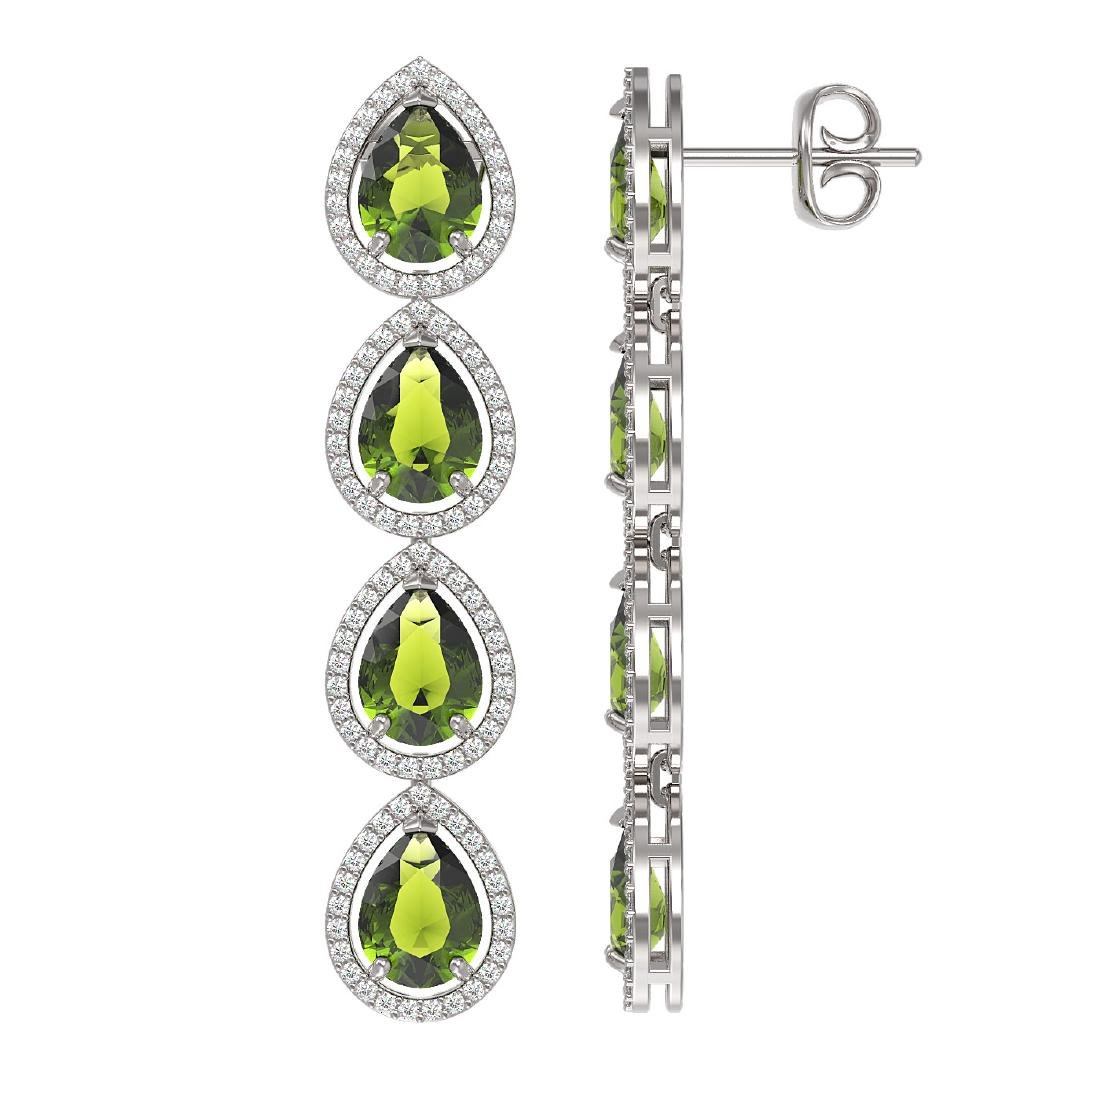 10.48 CTW Tourmaline & Diamond Halo Earrings 10K White - 2